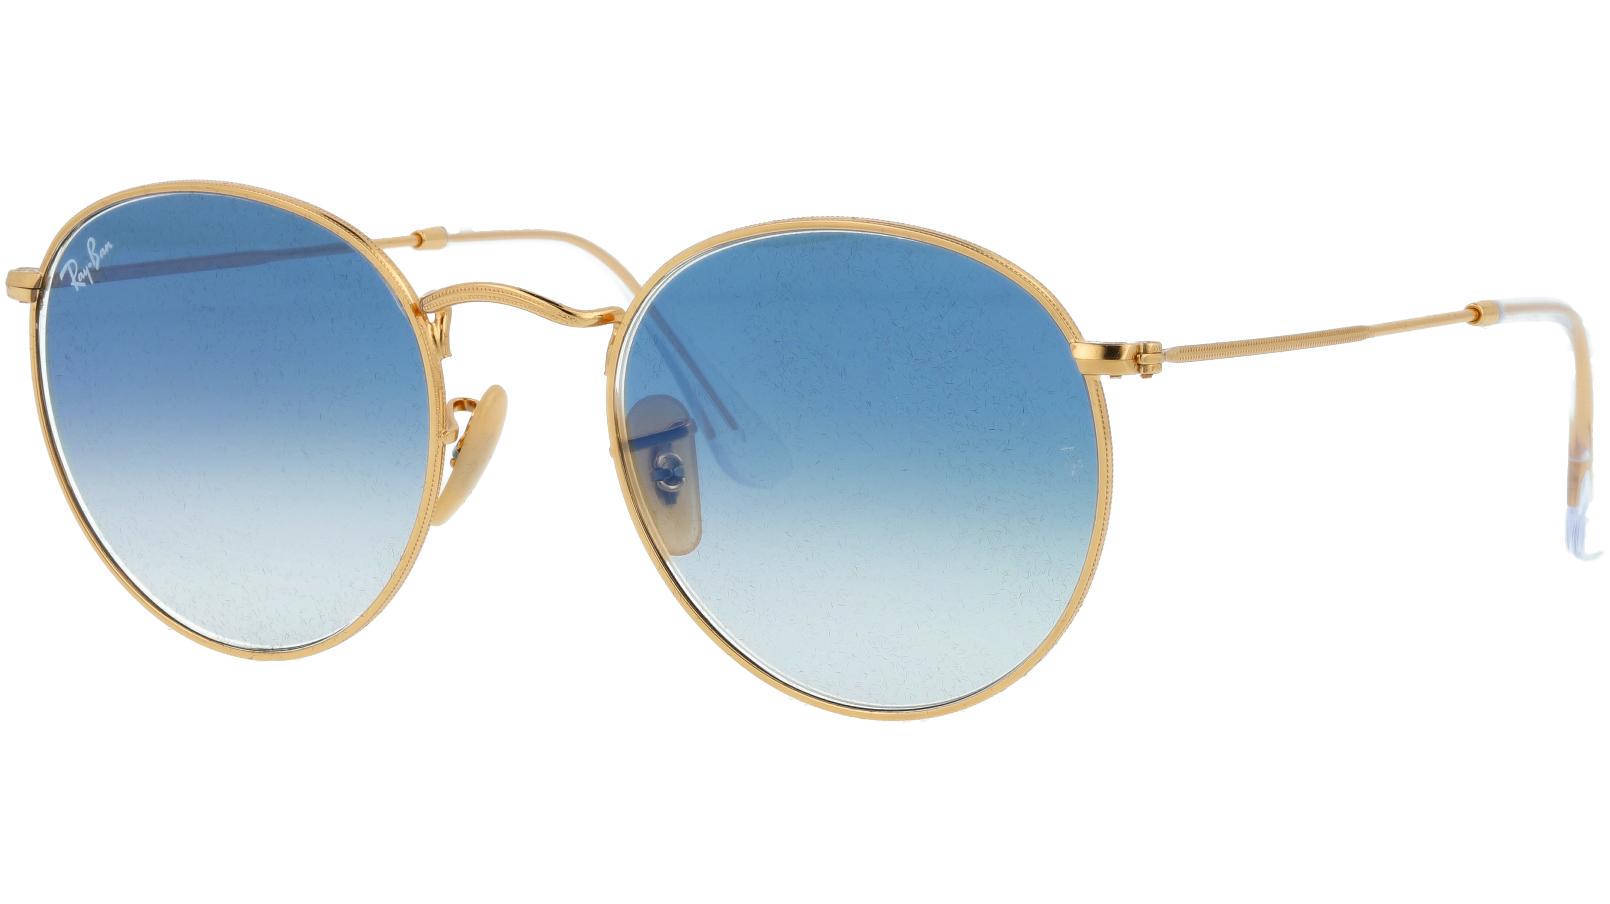 Ray-Ban RB3447N 001/3F Arista Round Sunglasses